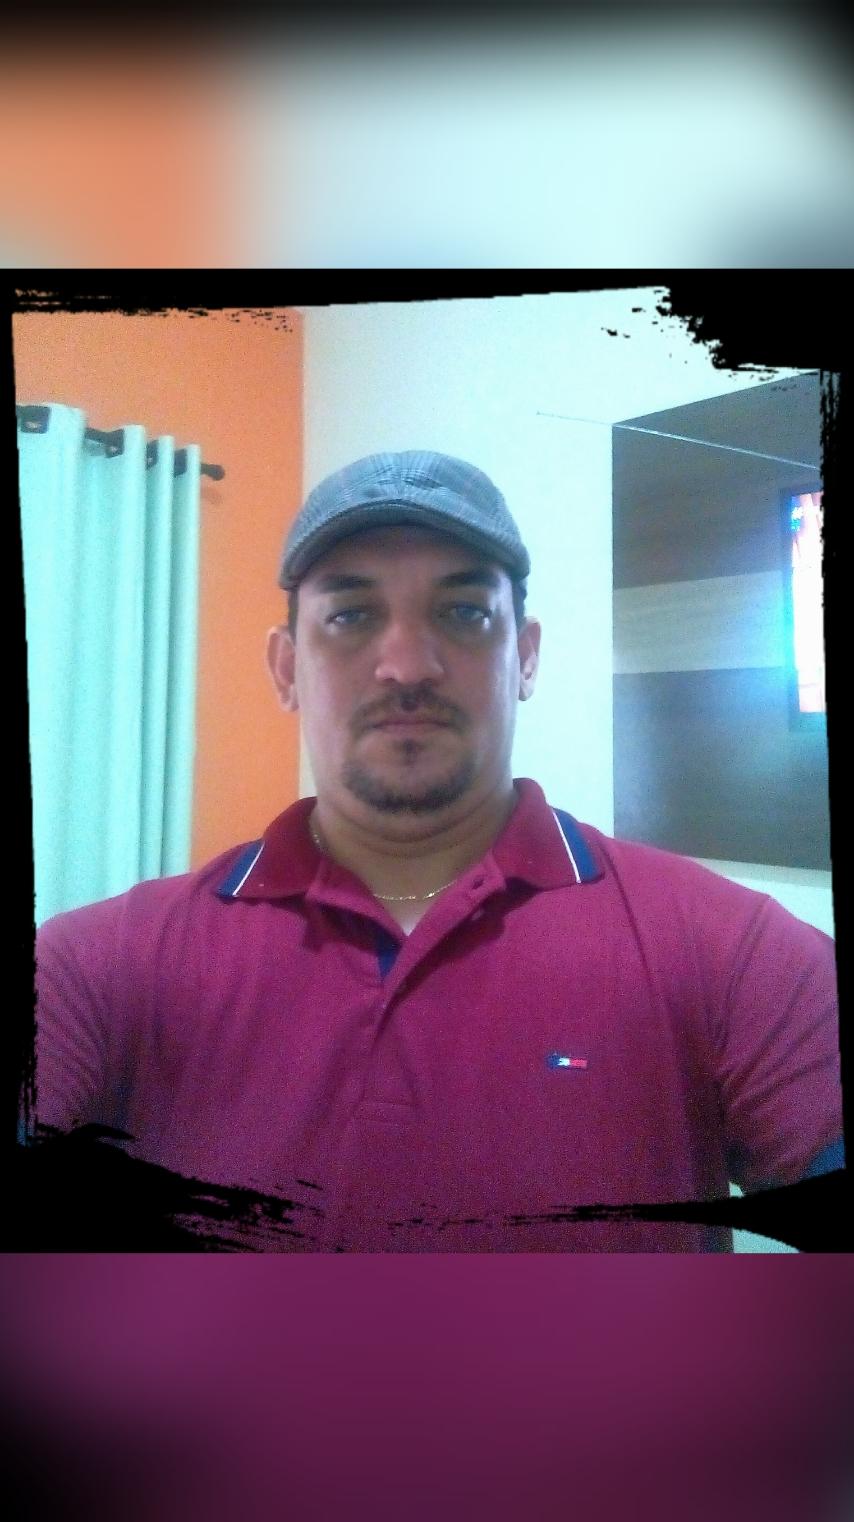 Anselmo Rodrigues